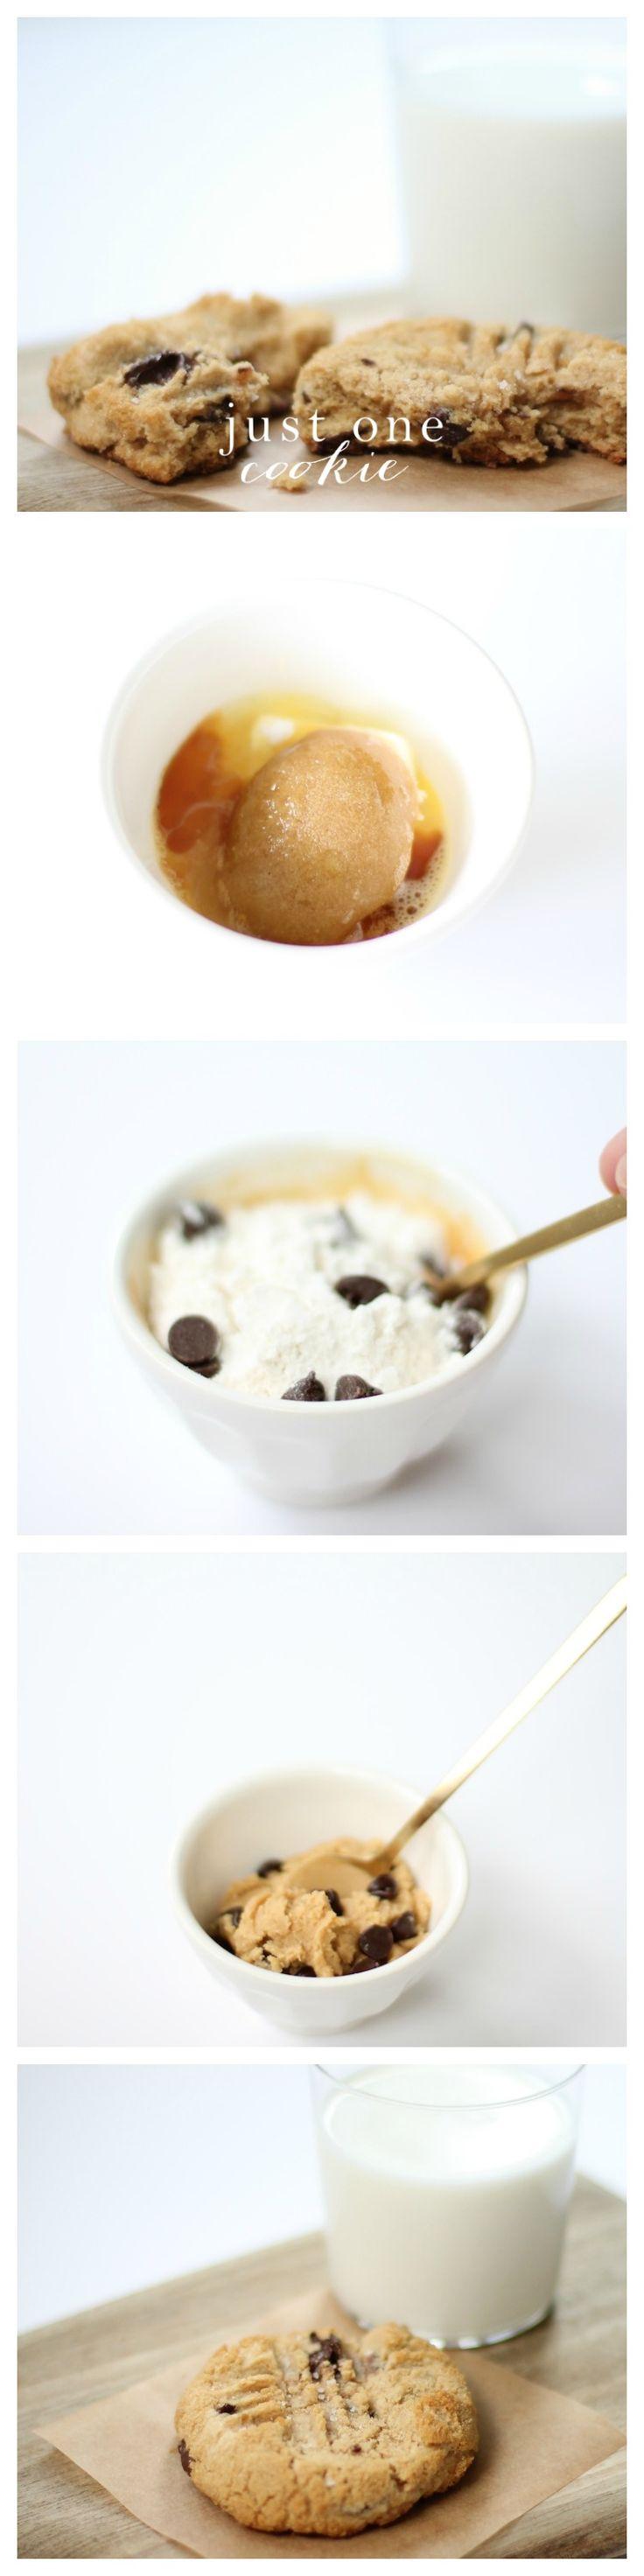 single-cookie-recipe2.jpg (750×3000)